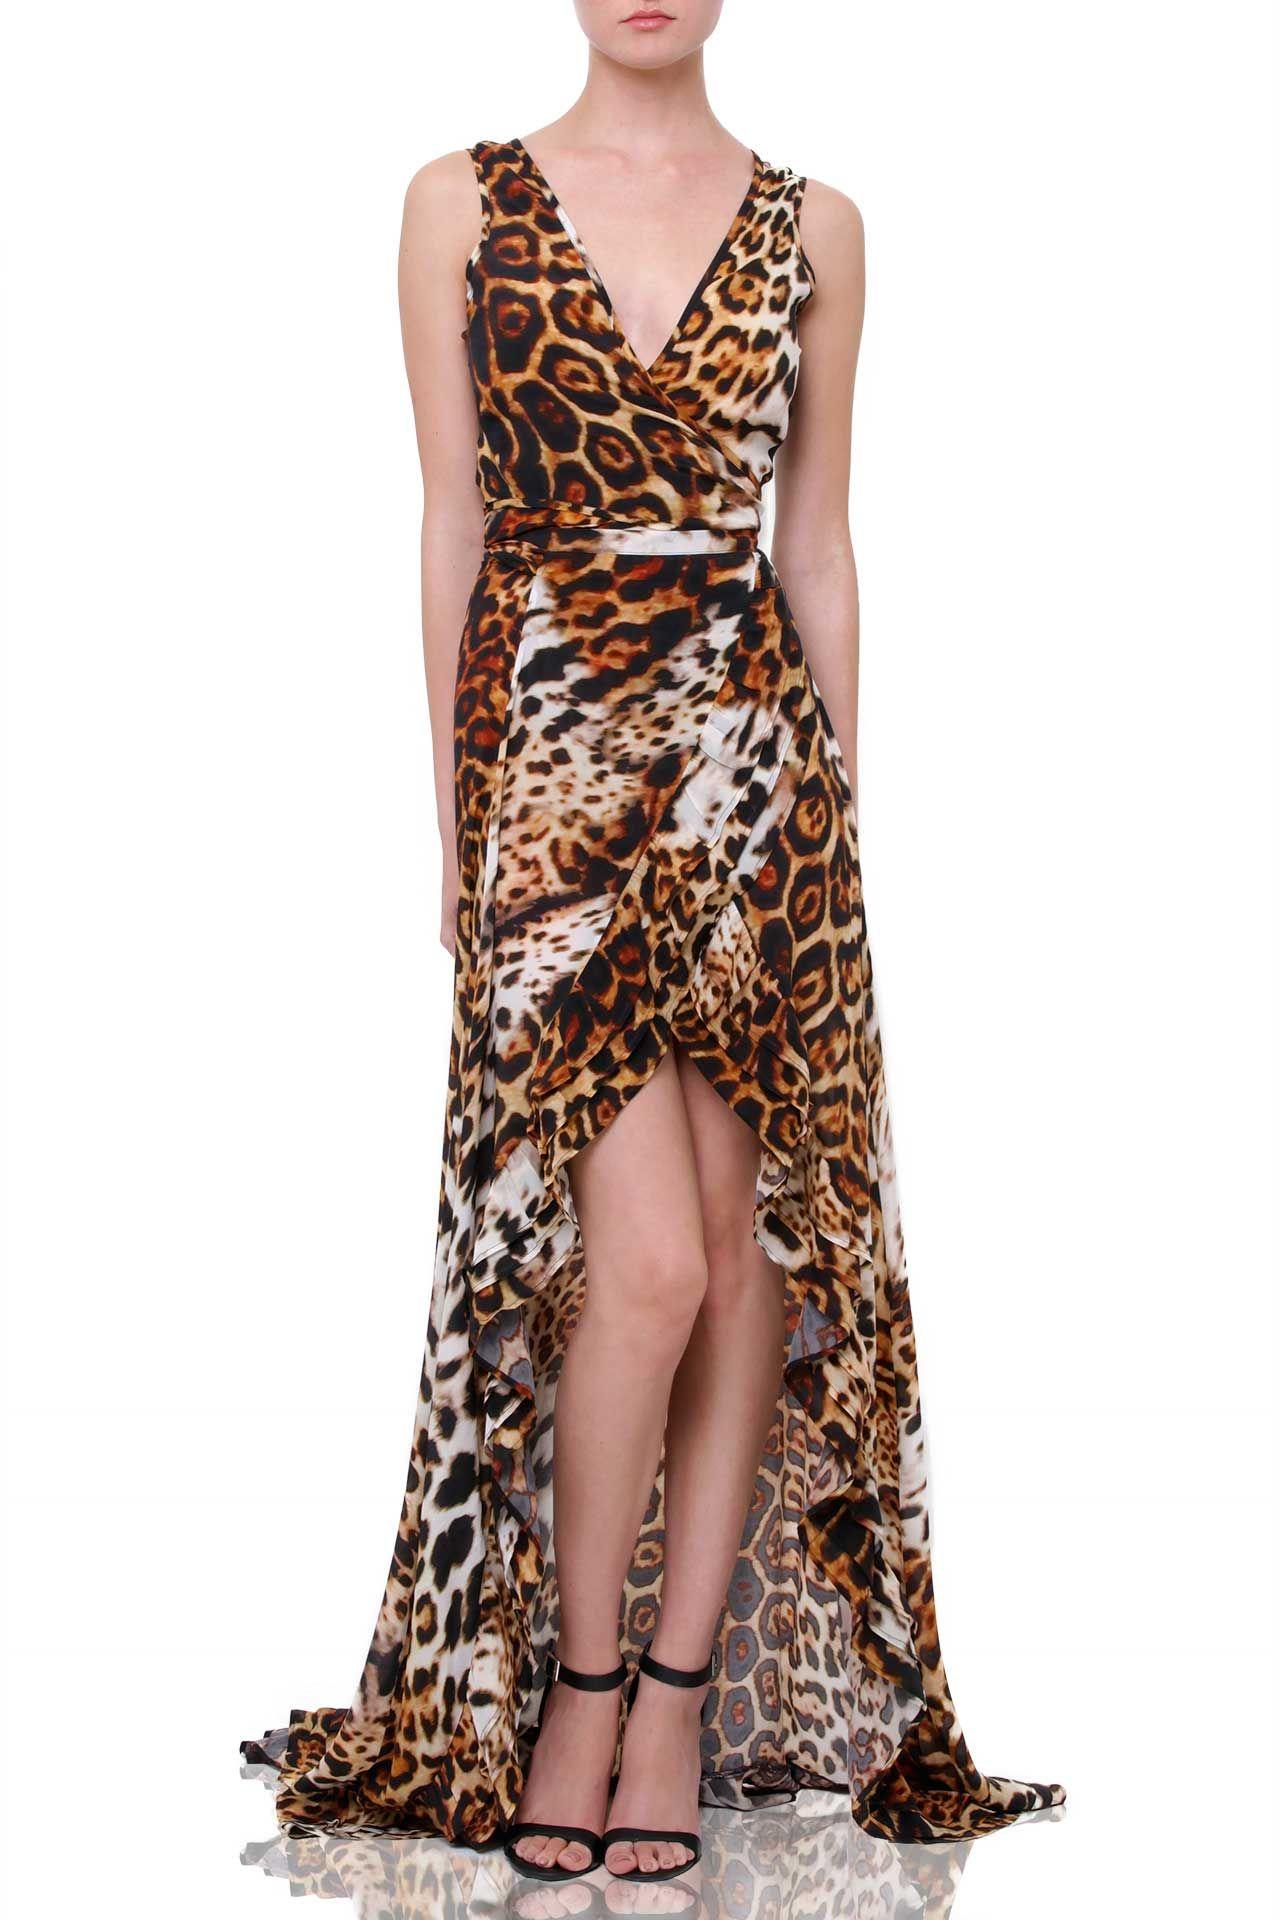 13++ Cheetah high low dress ideas